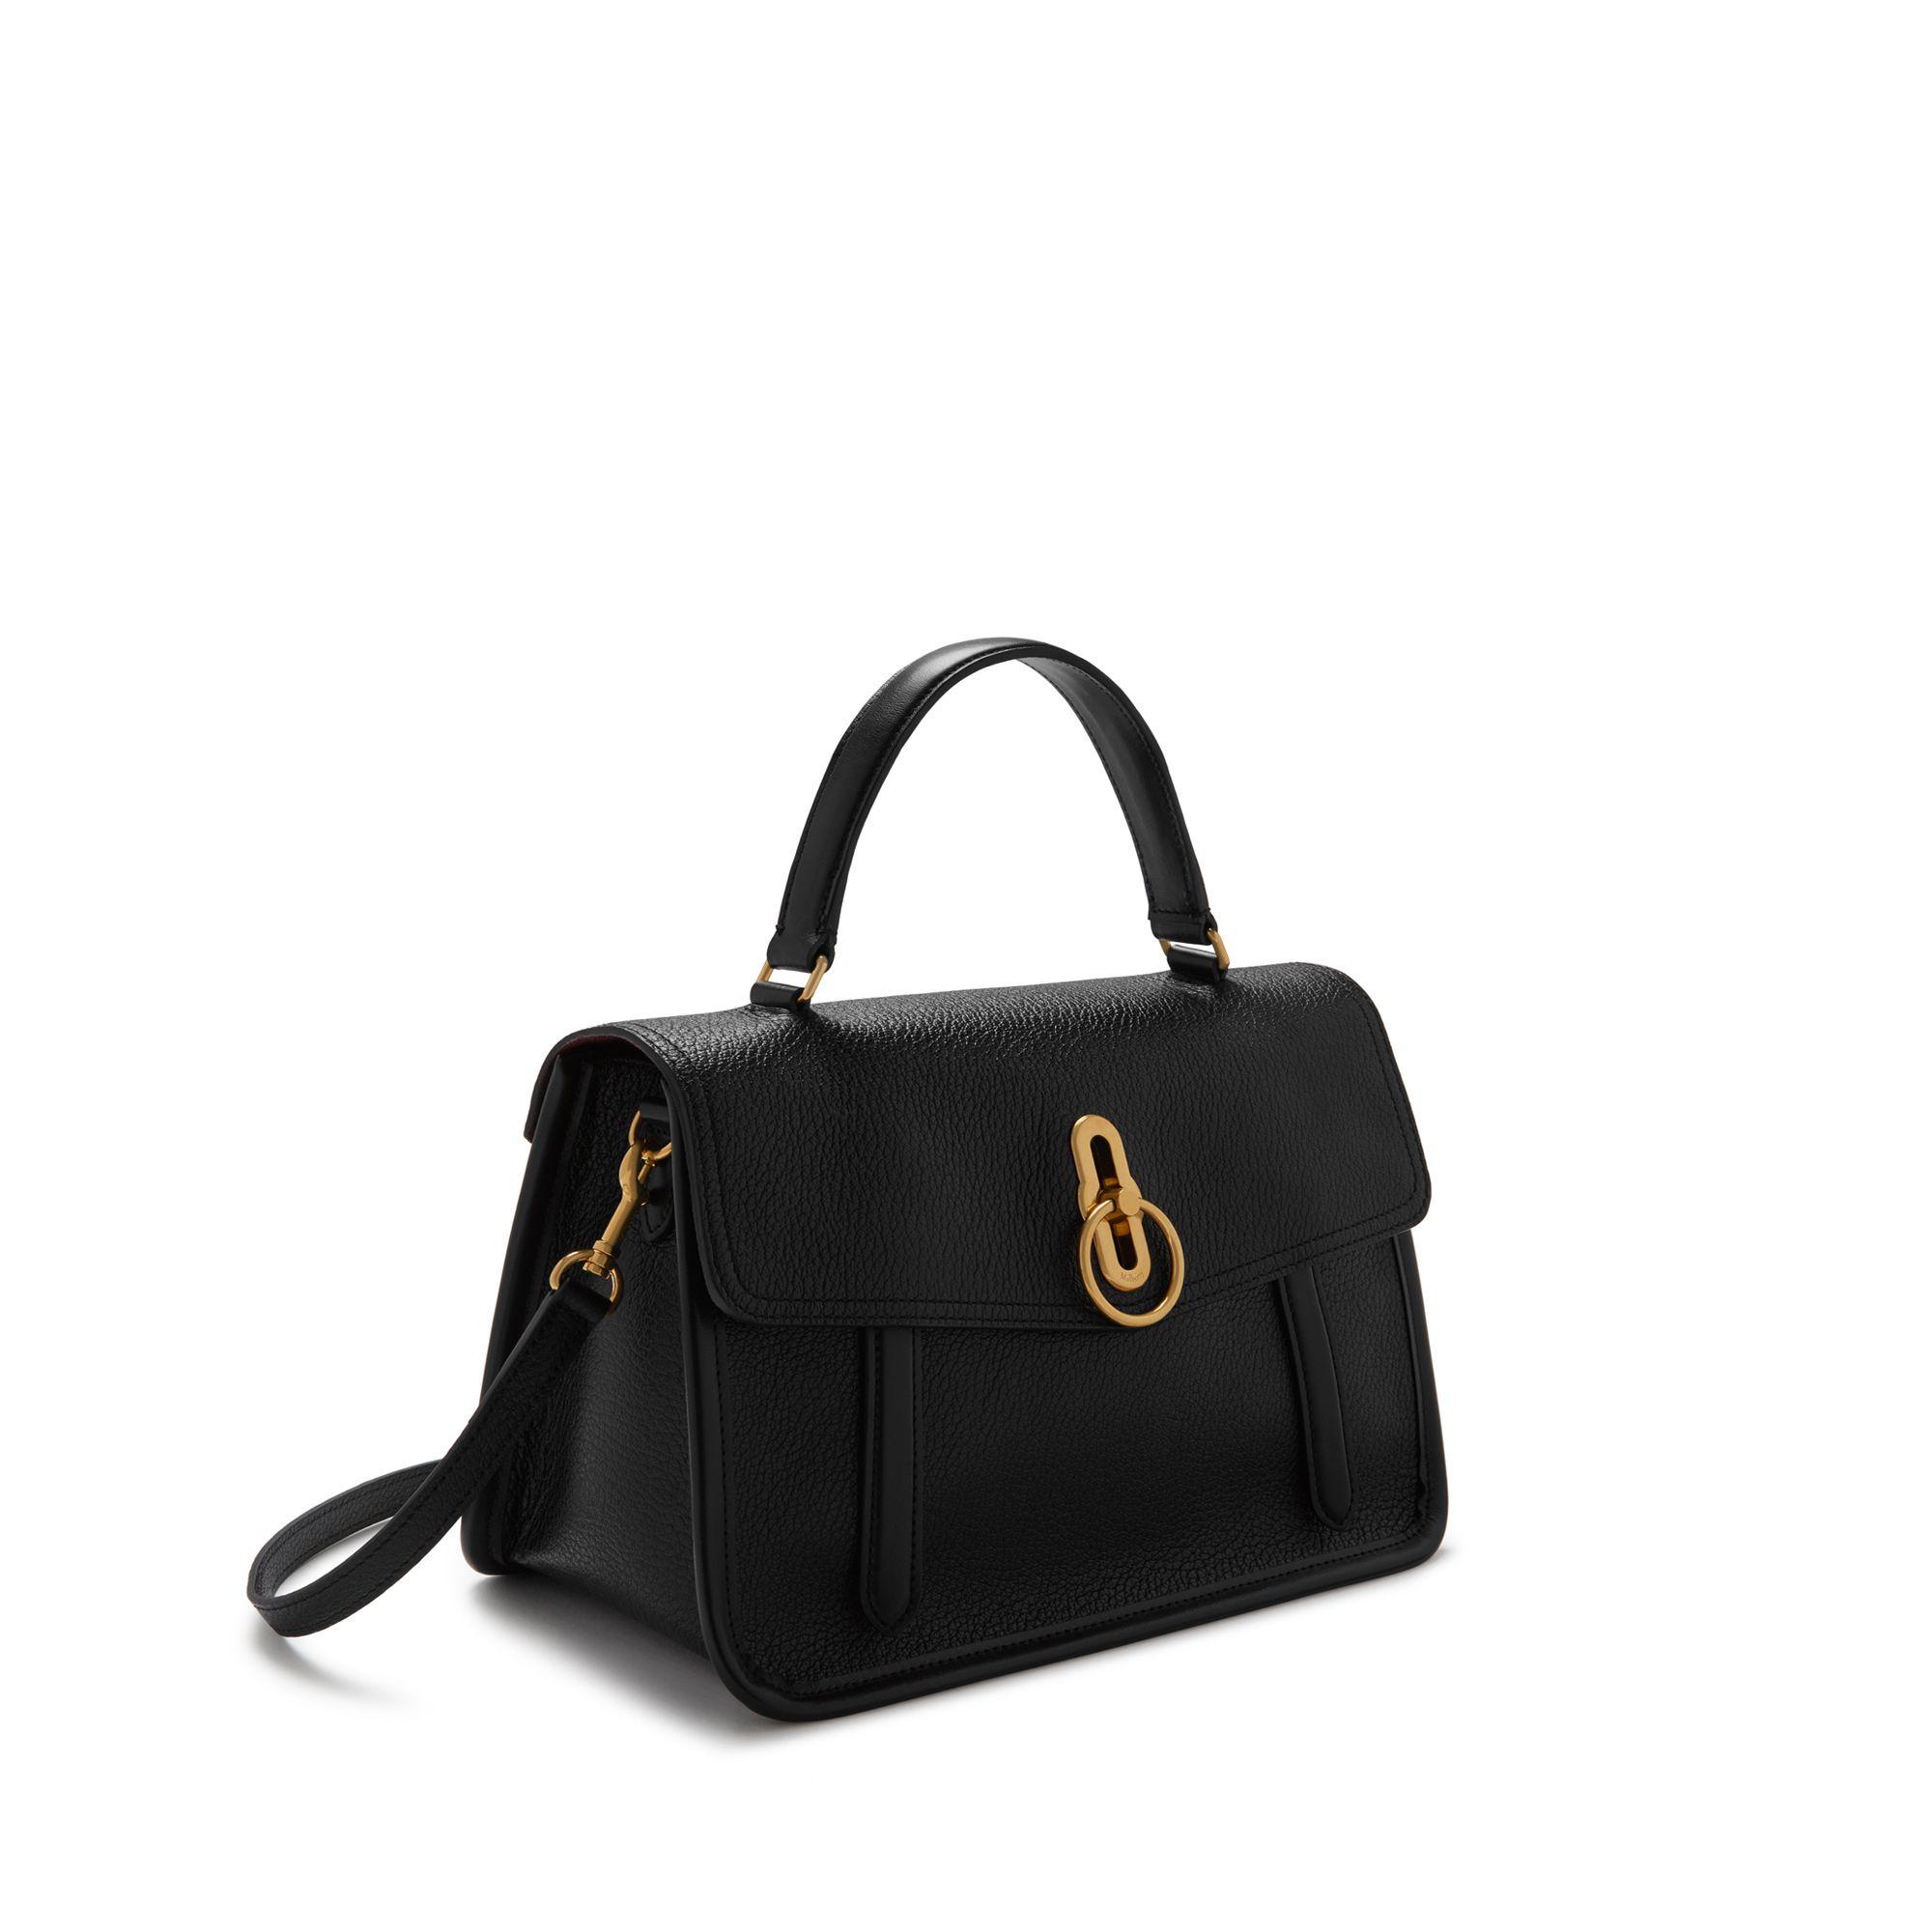 59aaf5c33dd switzerland mulberry darley leather shoulder bag selfridges edd67 a151b;  new style womens bags women mulberry e9553 53b57